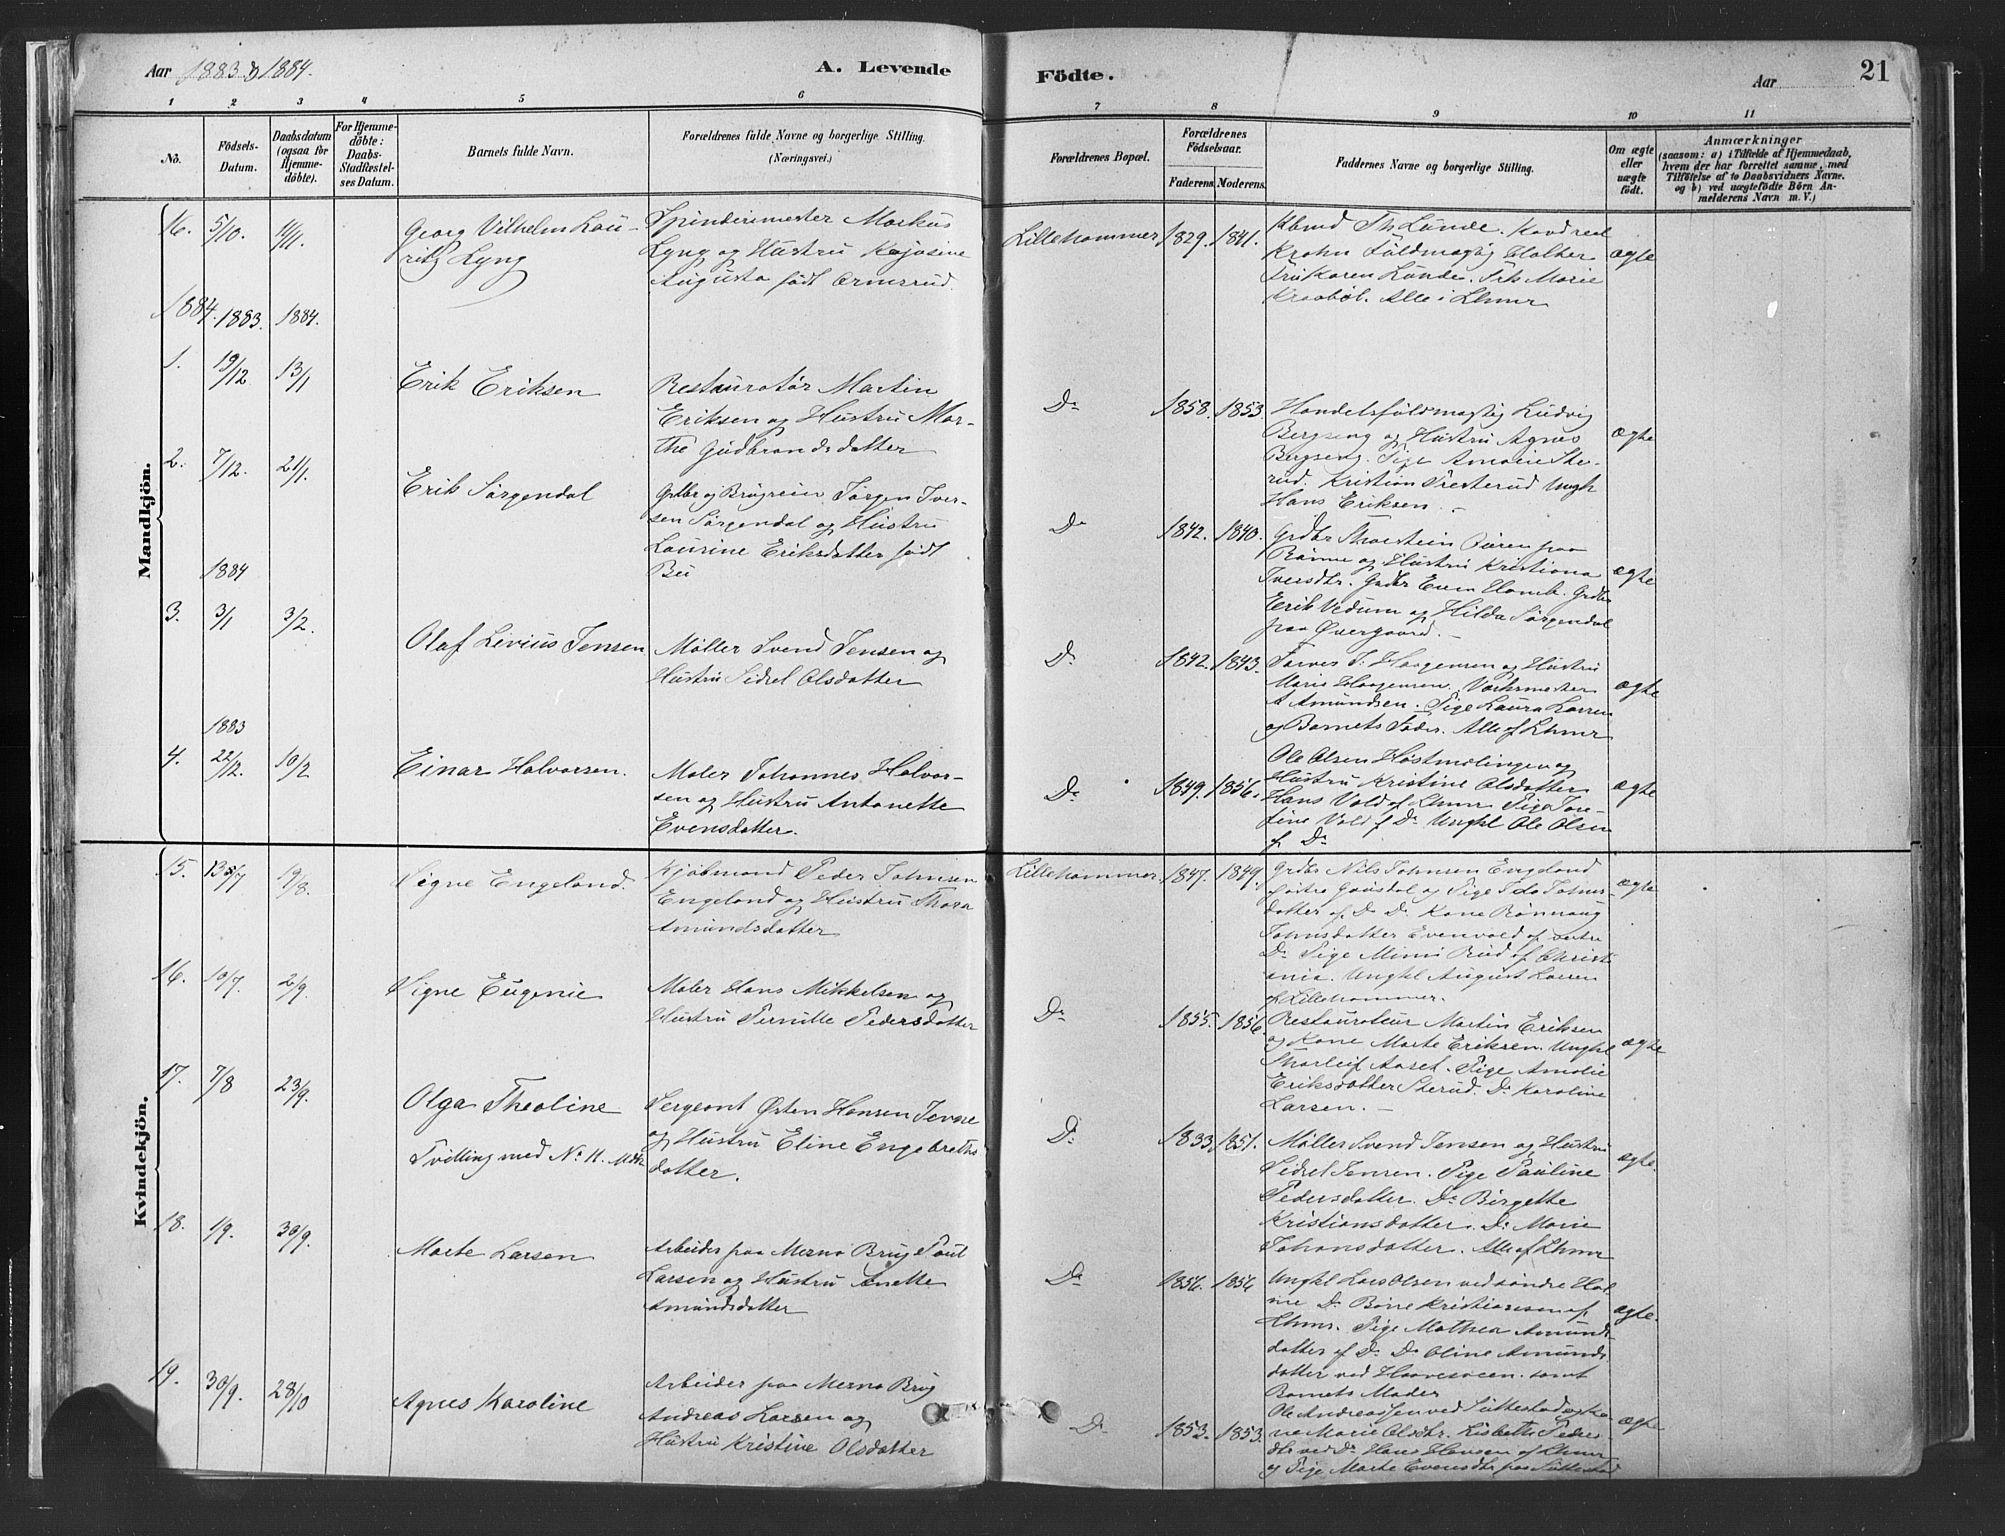 SAH, Fåberg prestekontor, Ministerialbok nr. 10, 1879-1900, s. 21